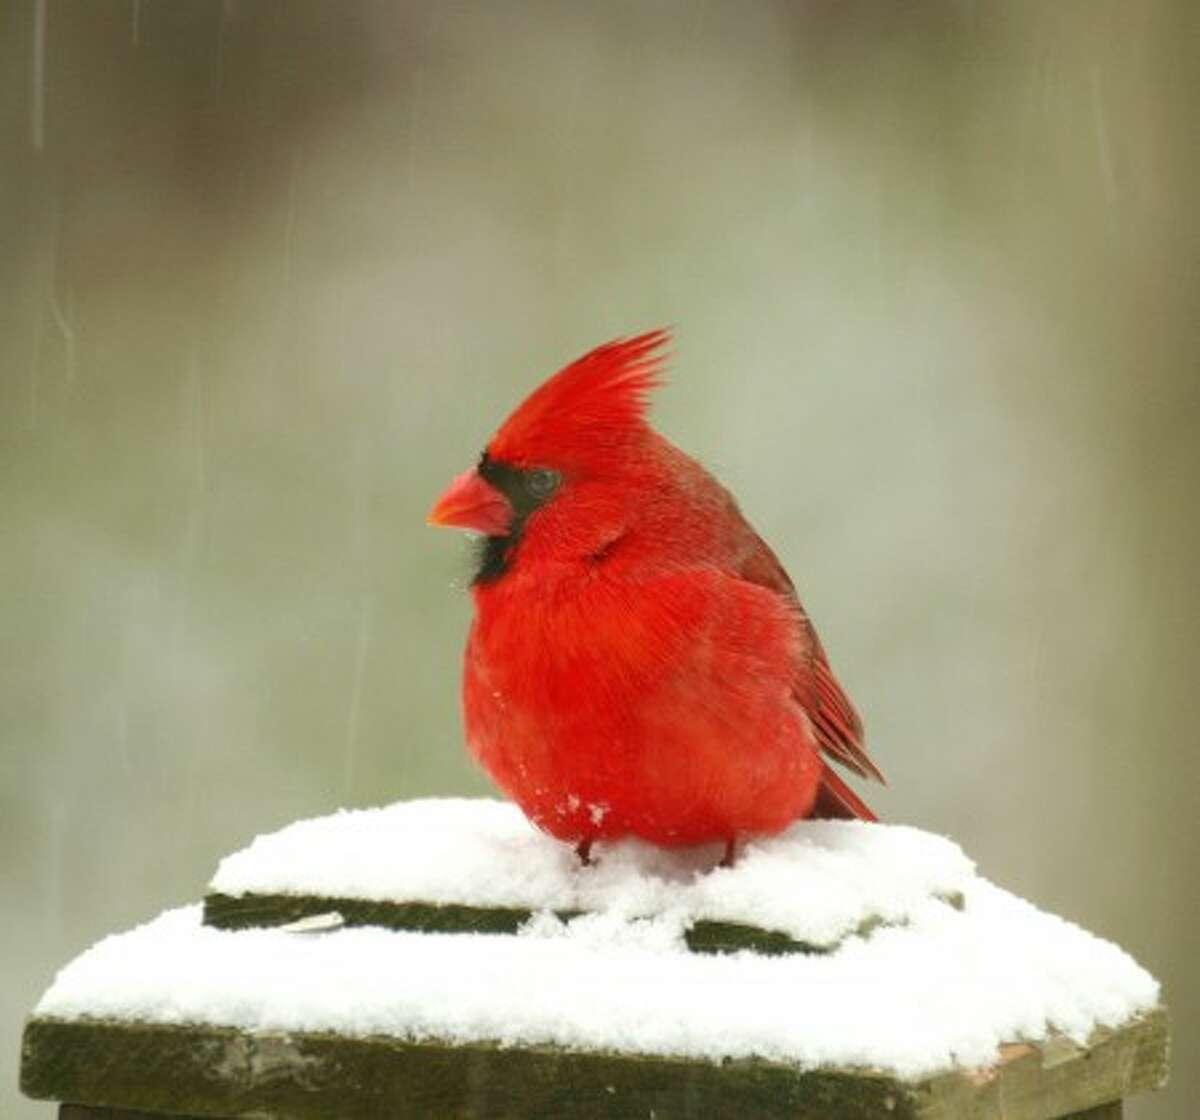 Hour photo / Chris Bosak Cardinal